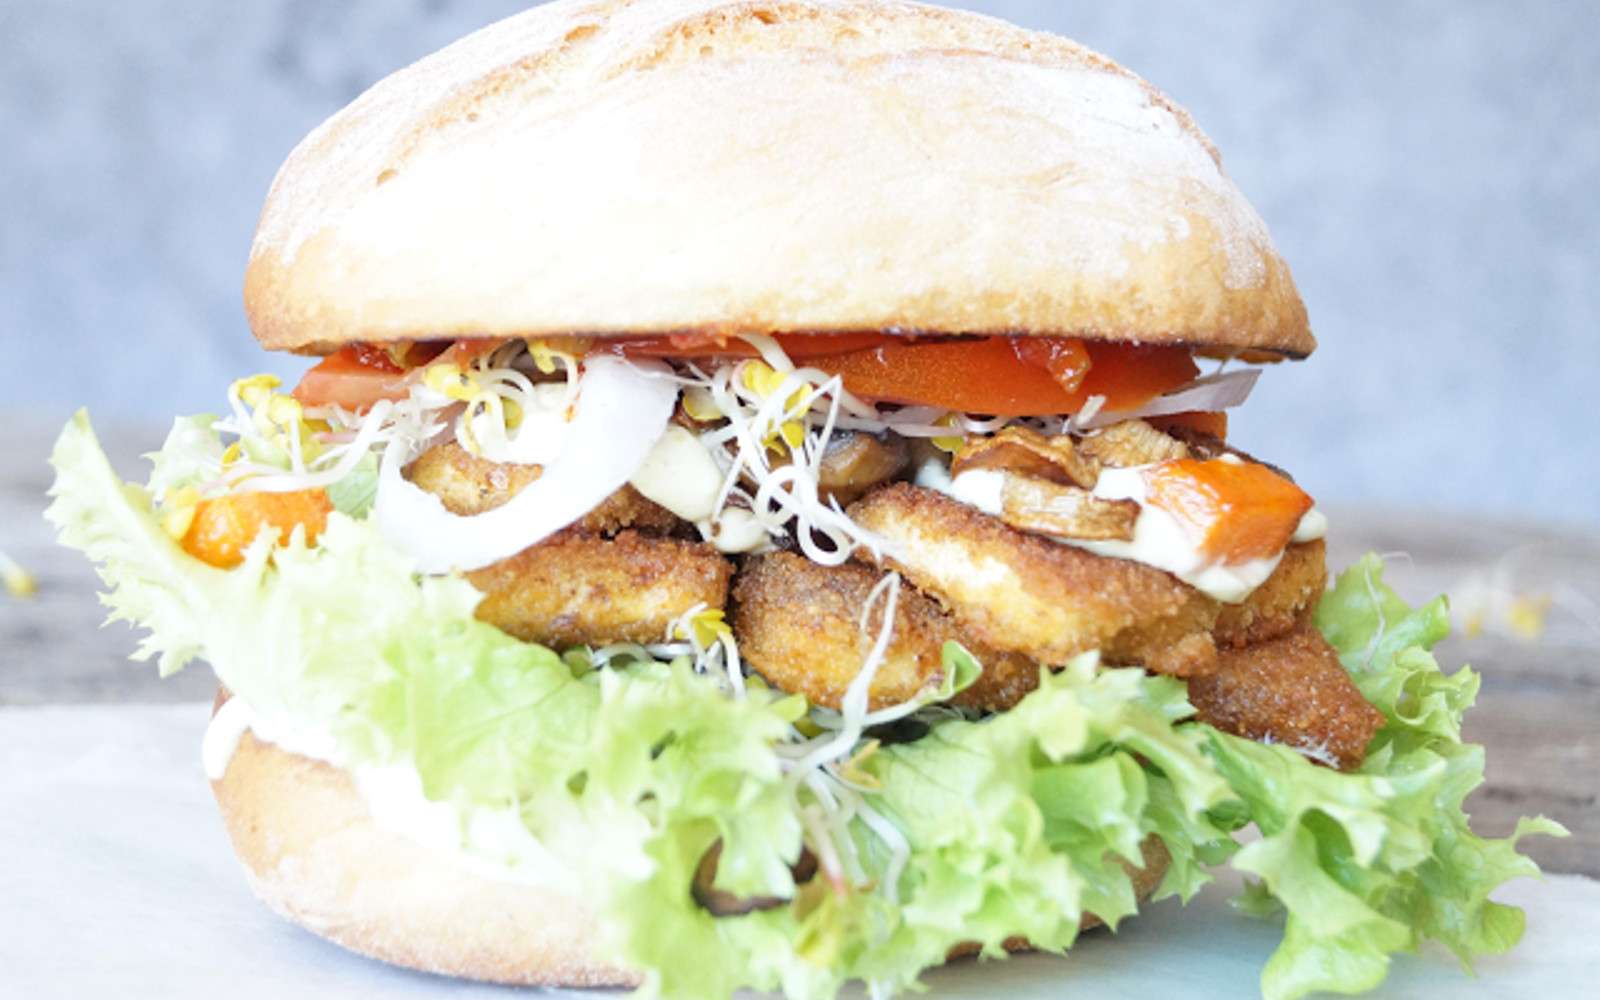 Mushroom and Tofu Cutlet Sandwich